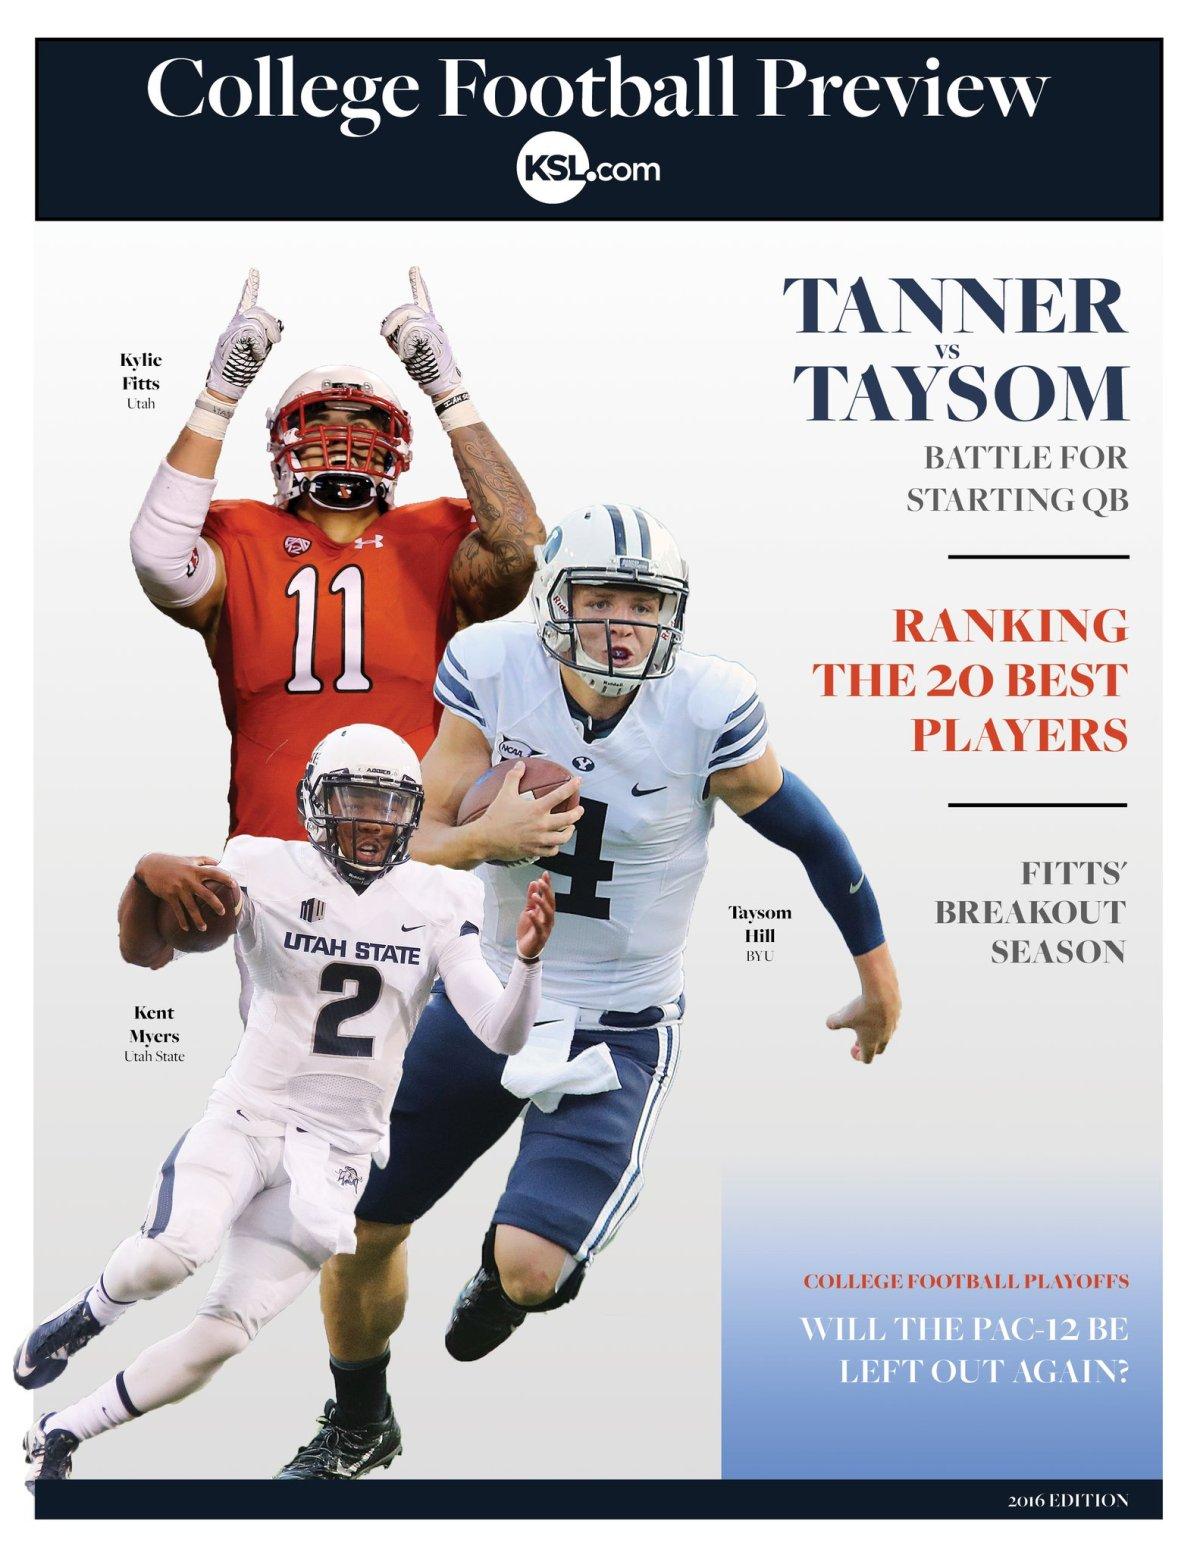 RT @KSLcom: College football is…